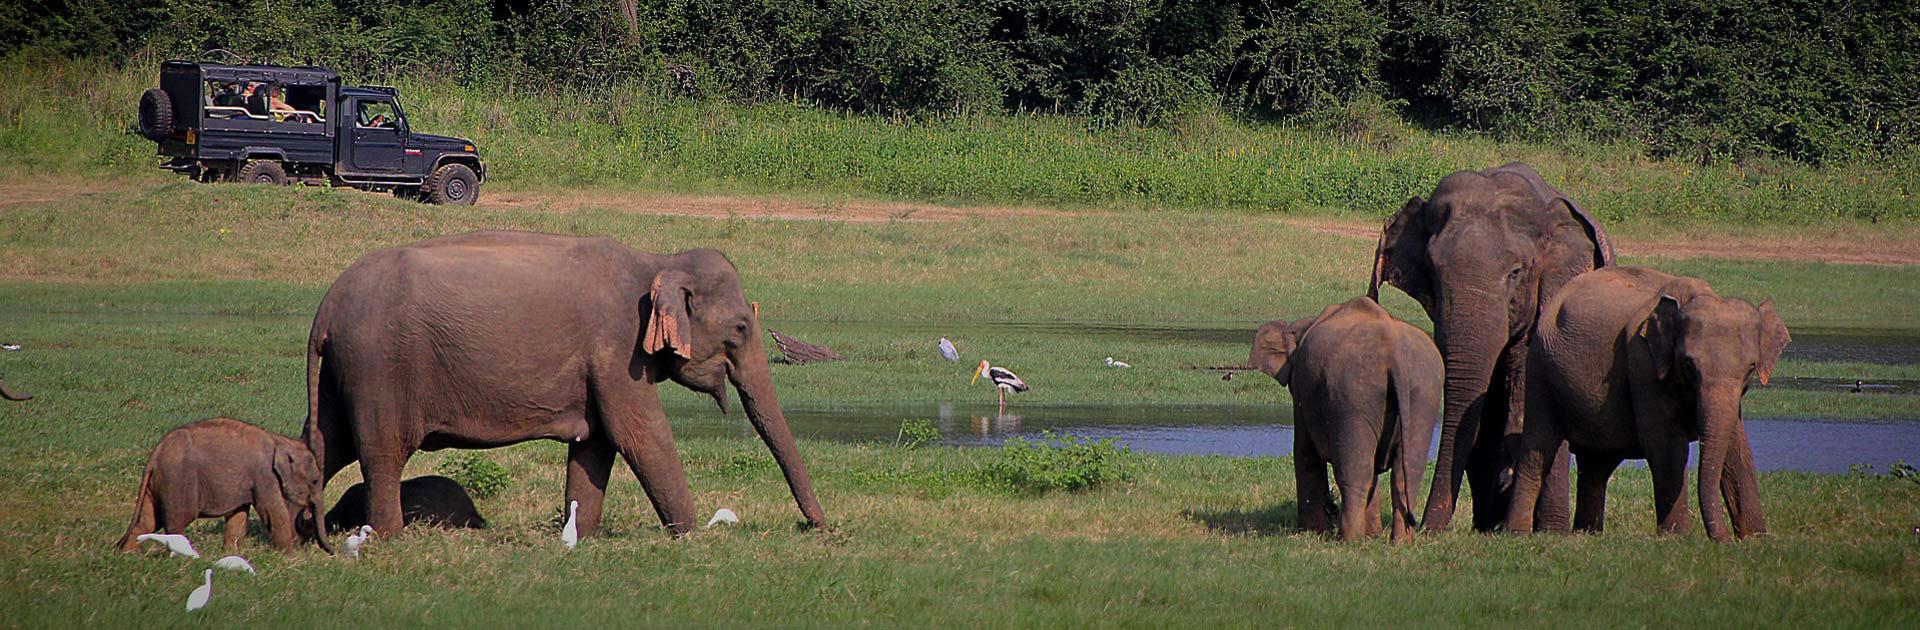 LK Explore Sri Lanka 9 días 2